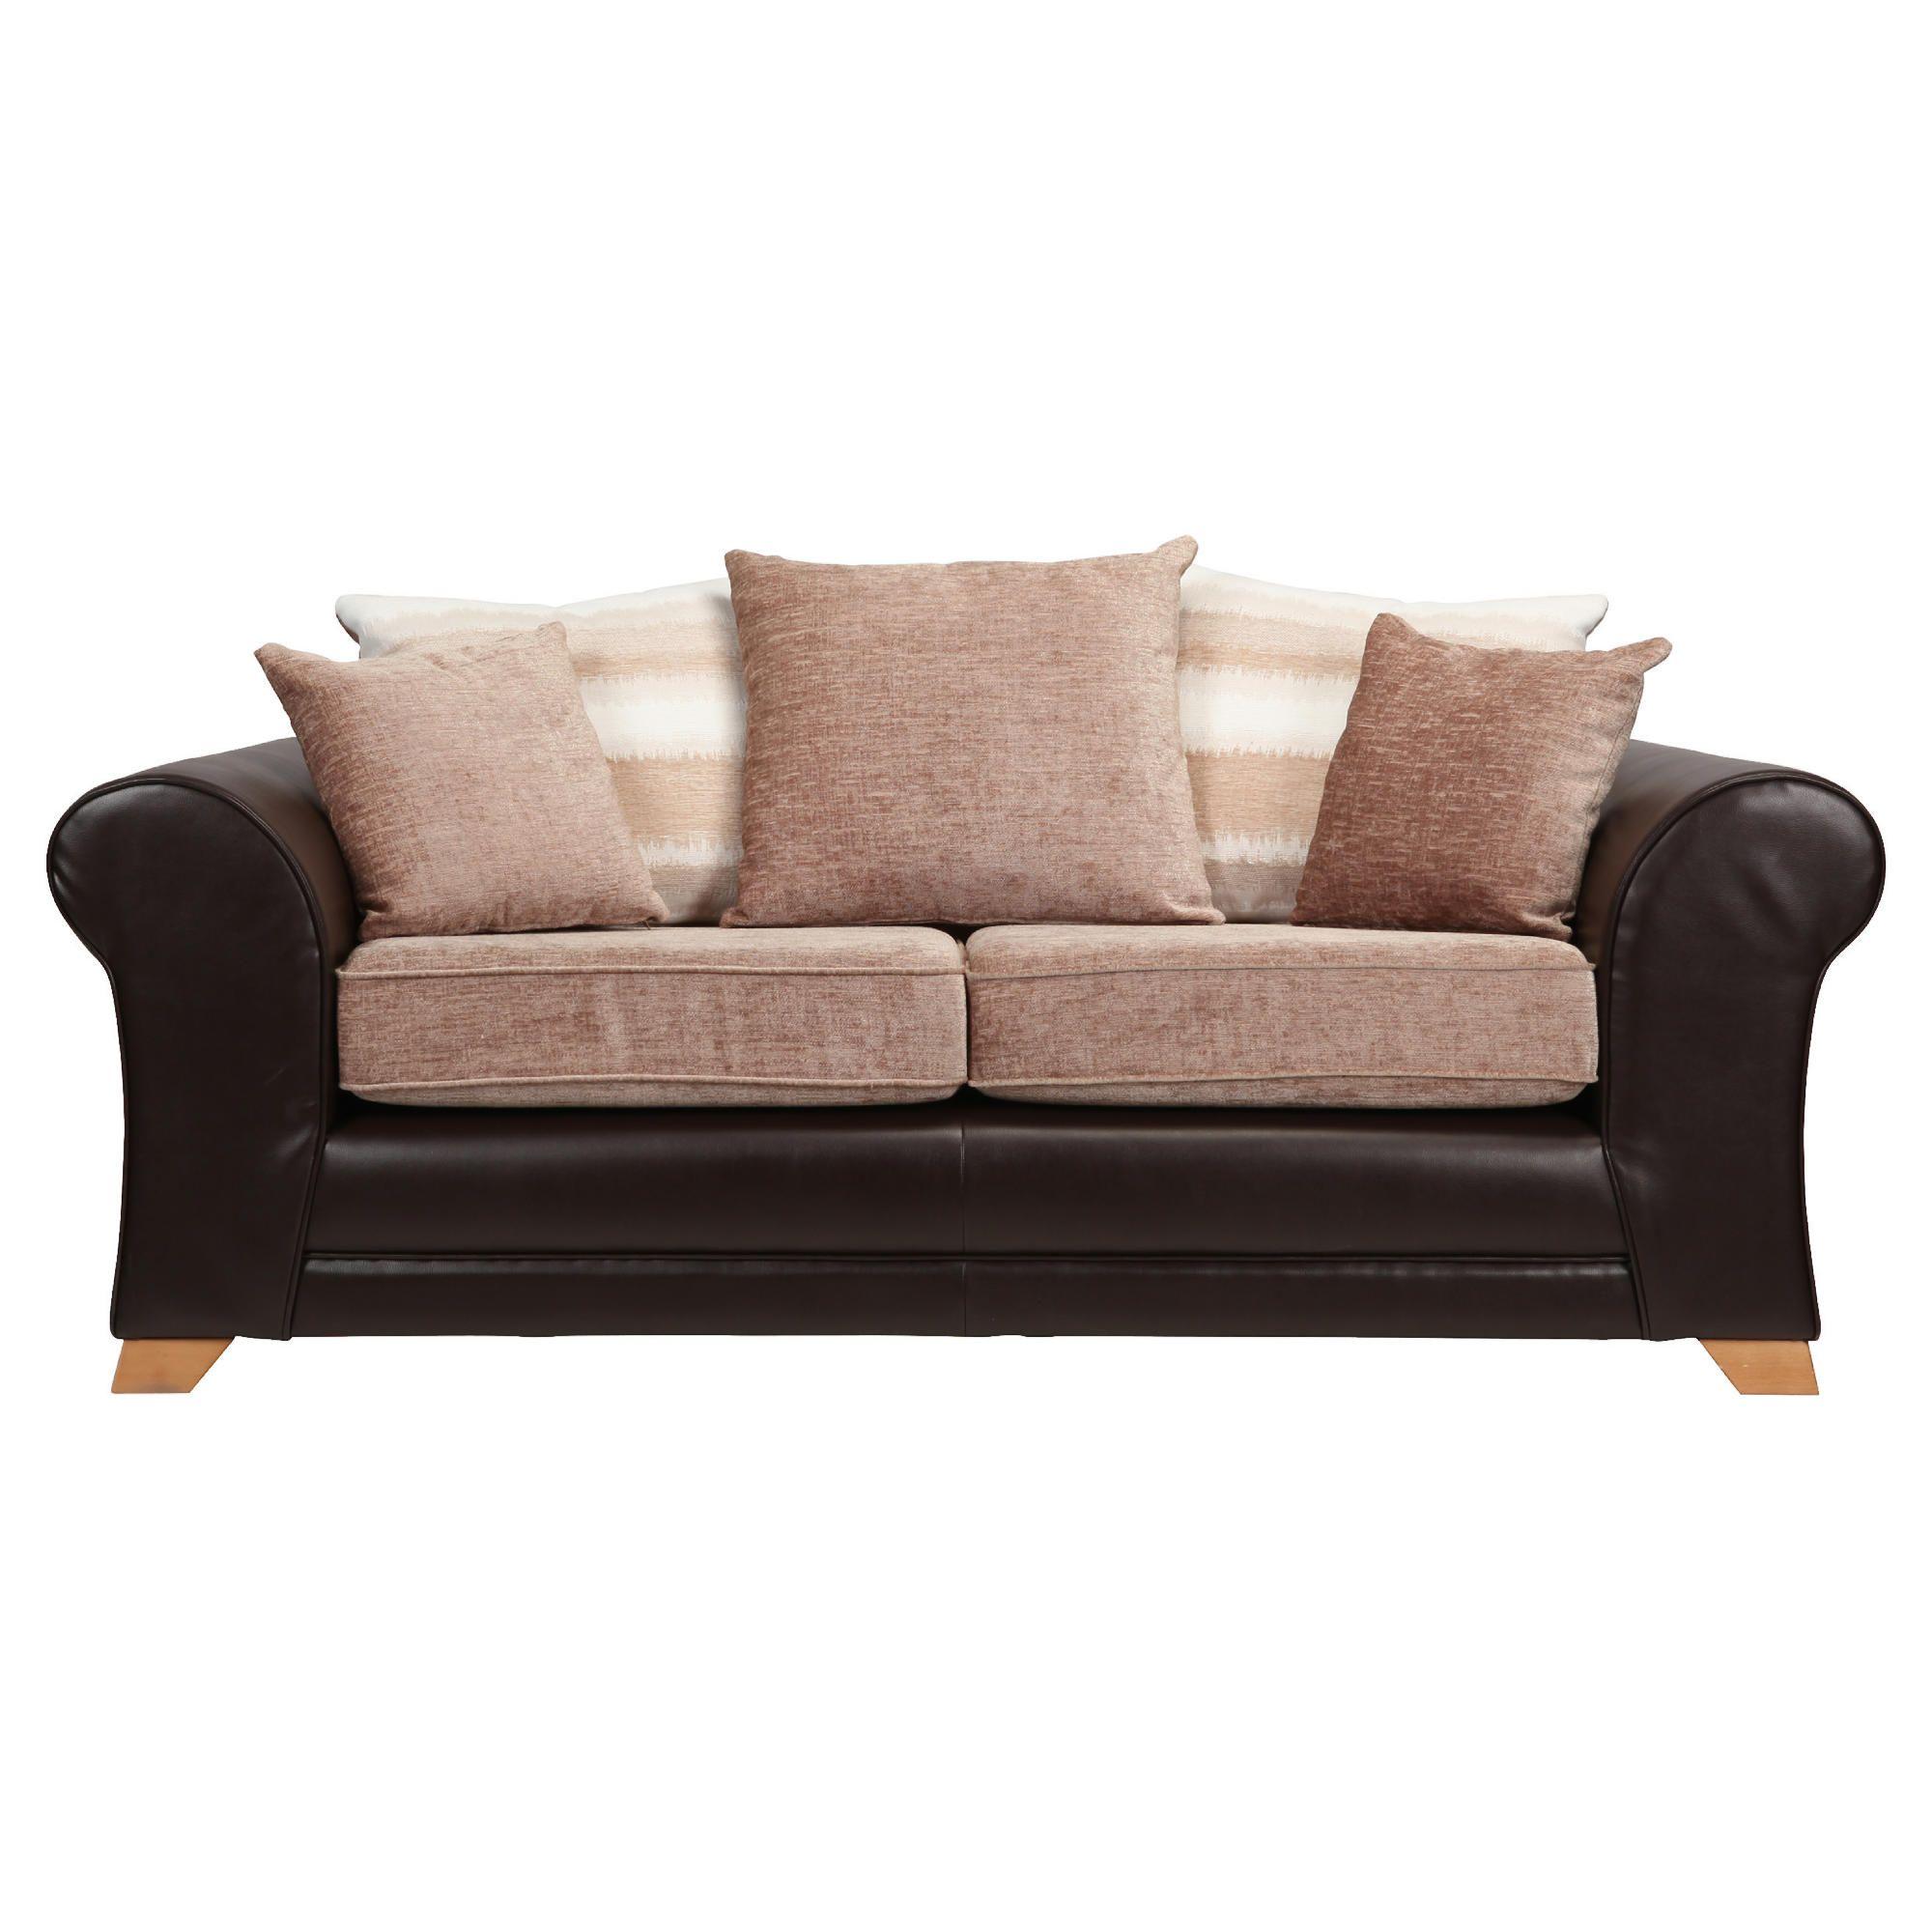 Lima fabric mix medium sofa chocolate and mink at Tesco Direct